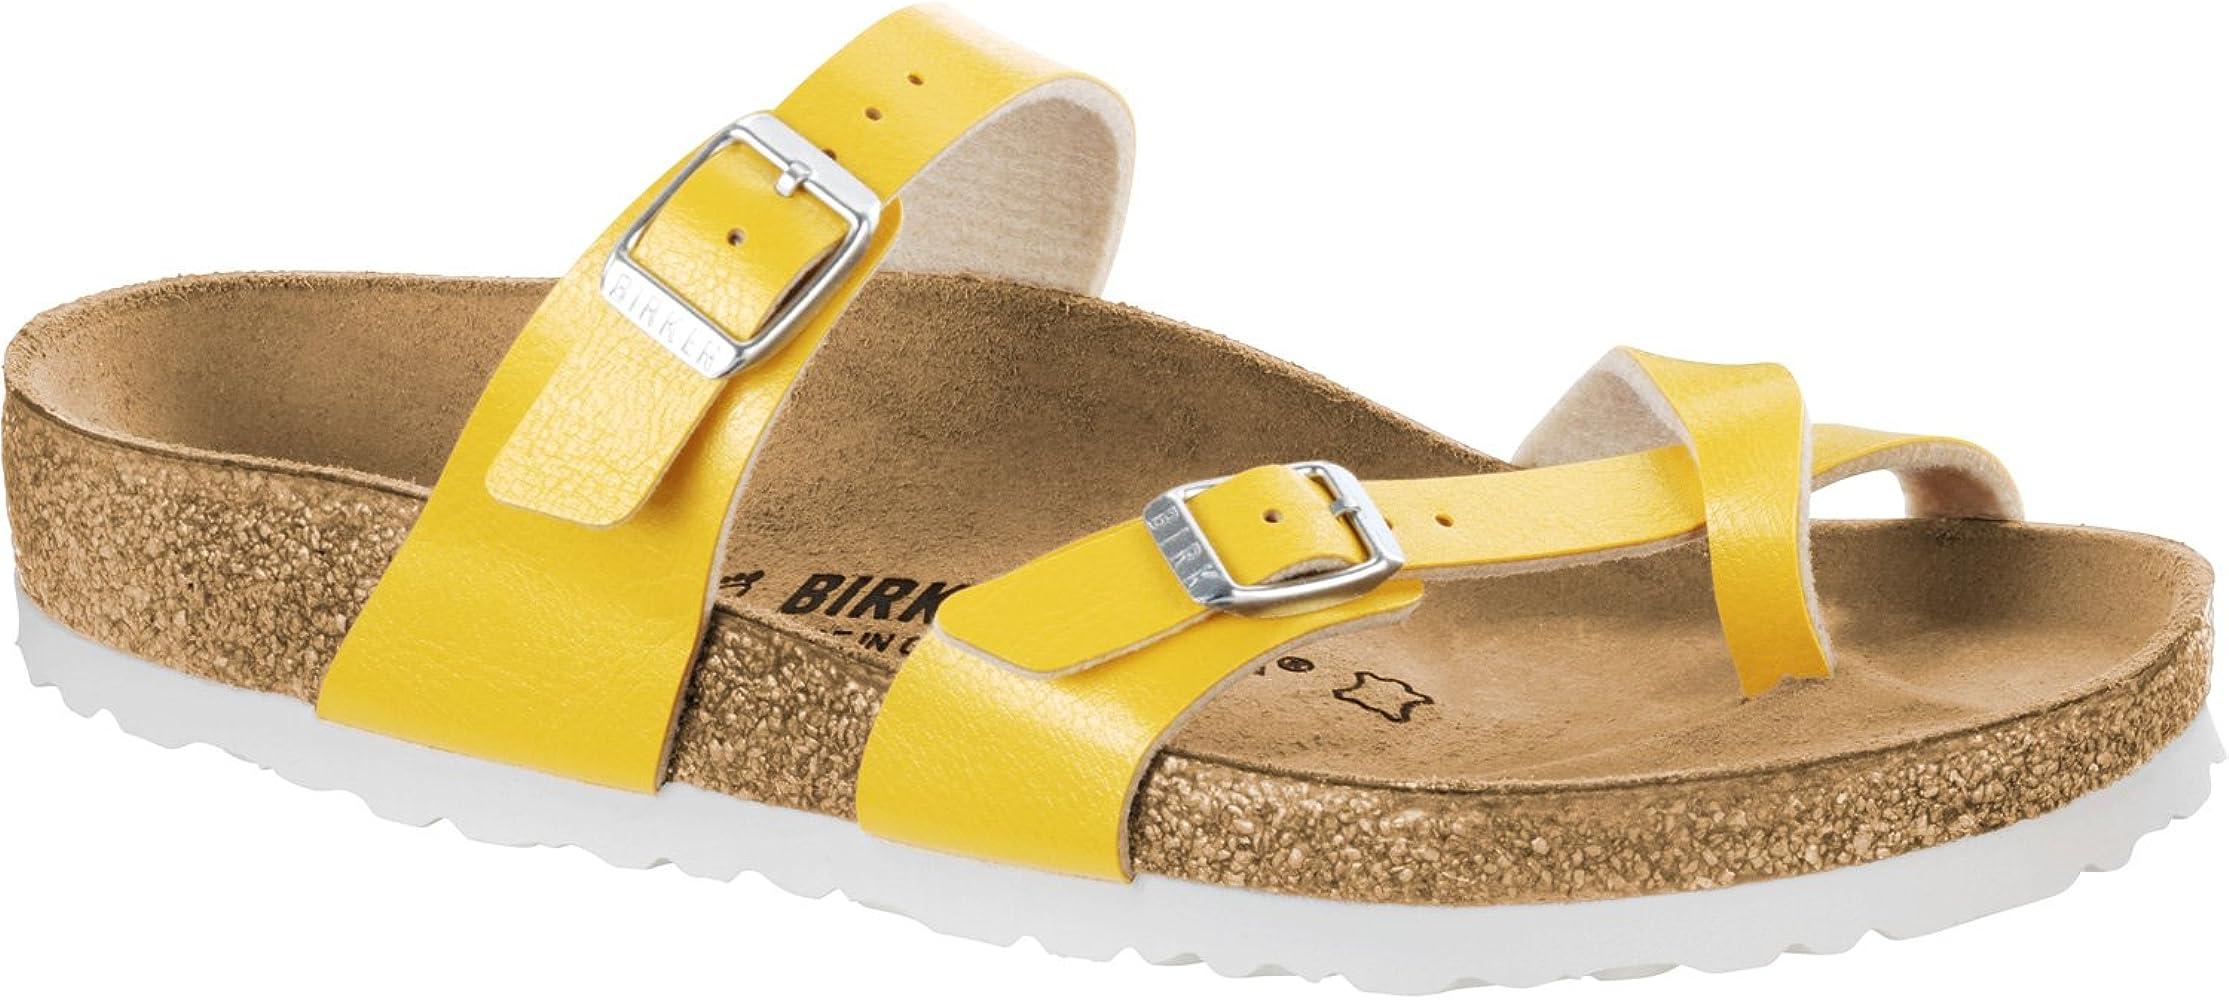 27b892667 Birkenstock Mayari BF W thong sandals amber yellow: Amazon.co.uk ...